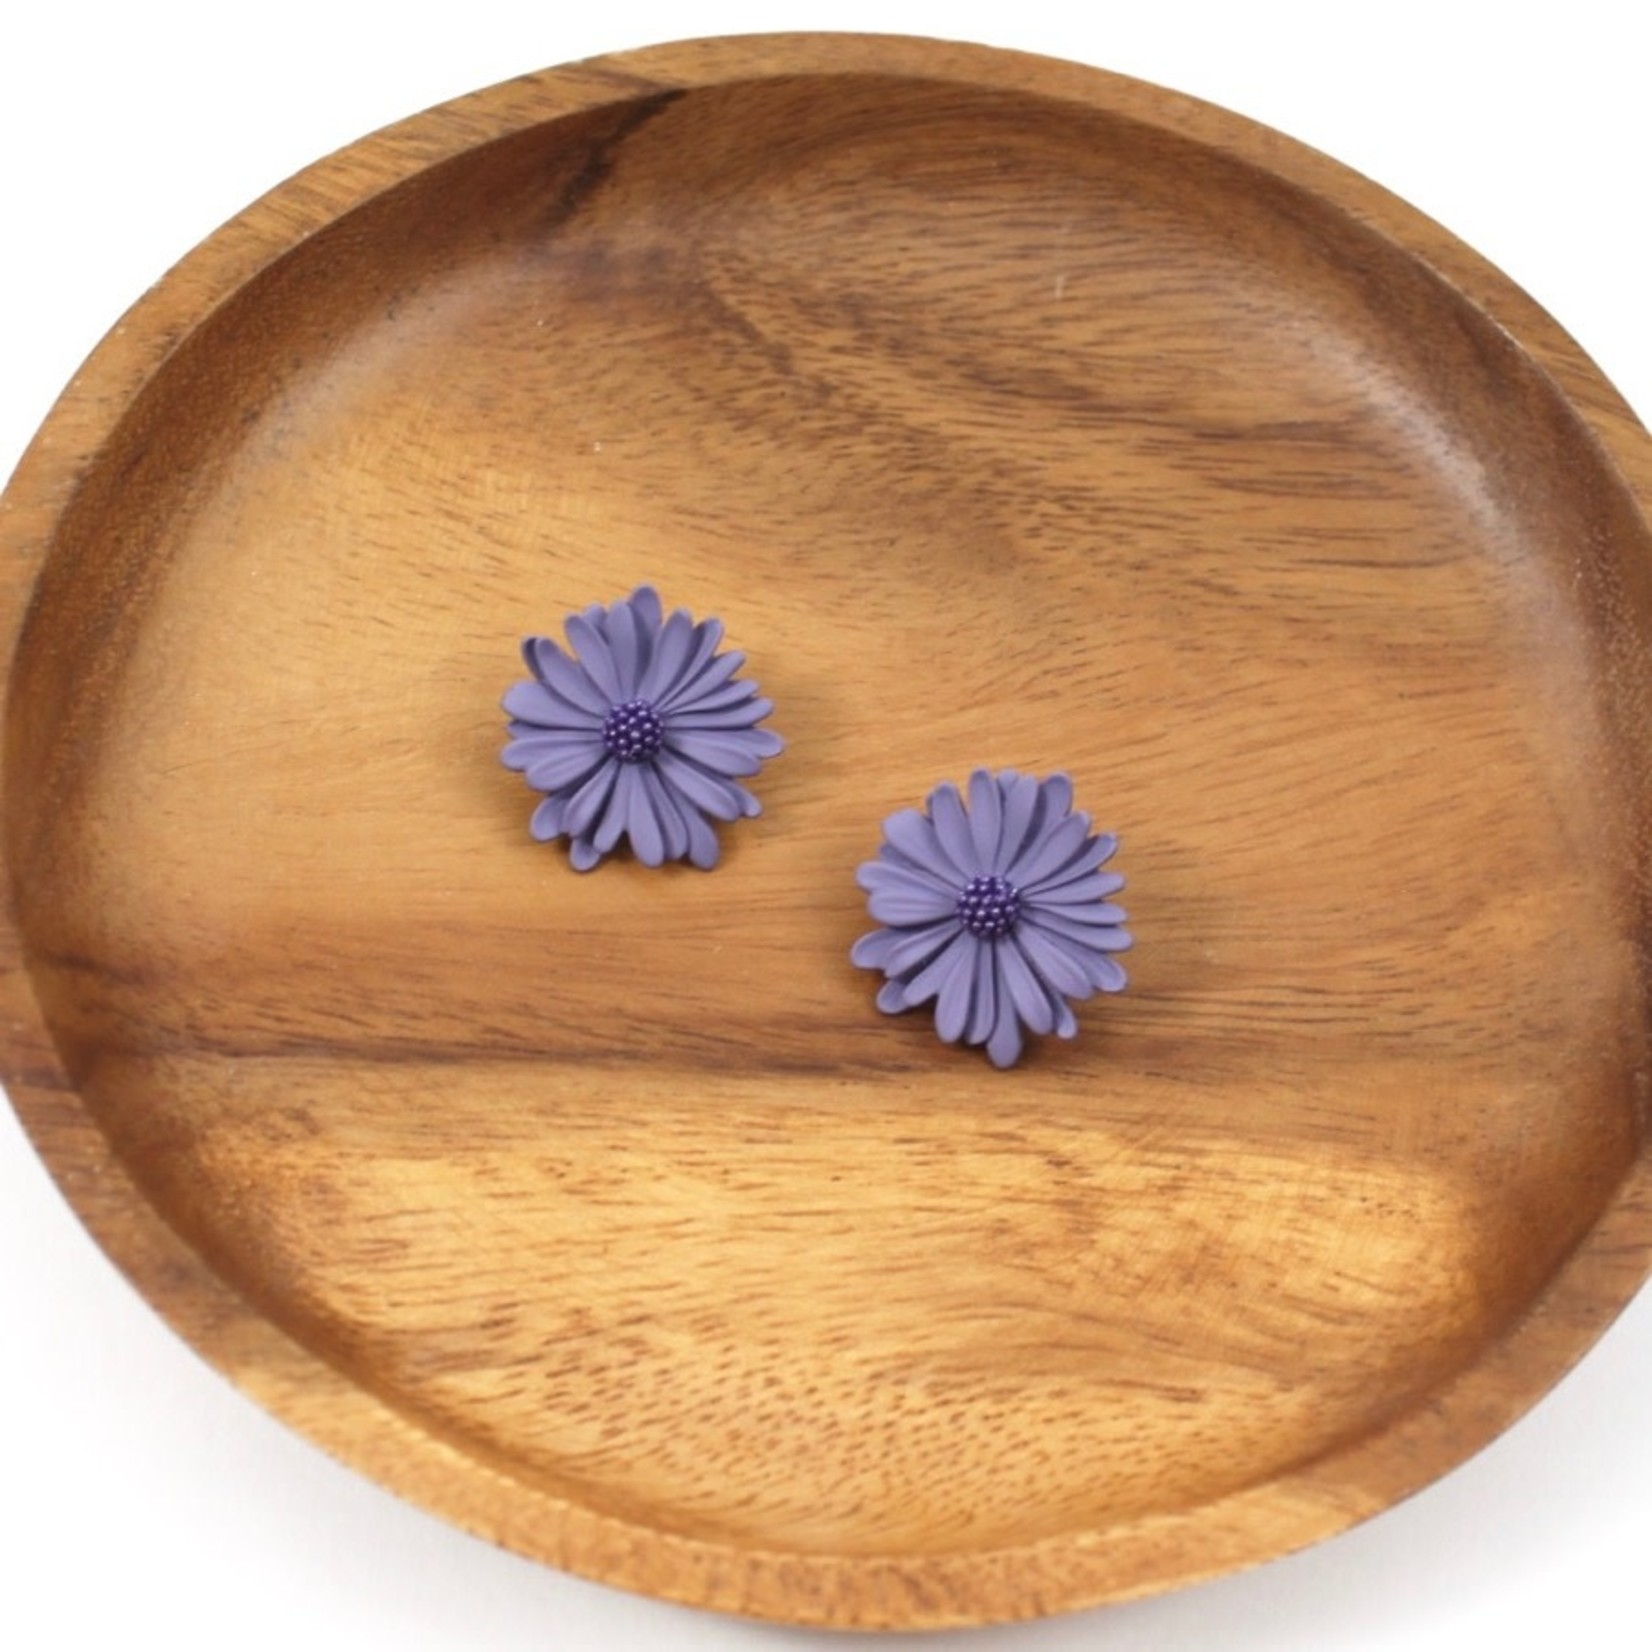 Dark Lavender Daisy Stud Earrings